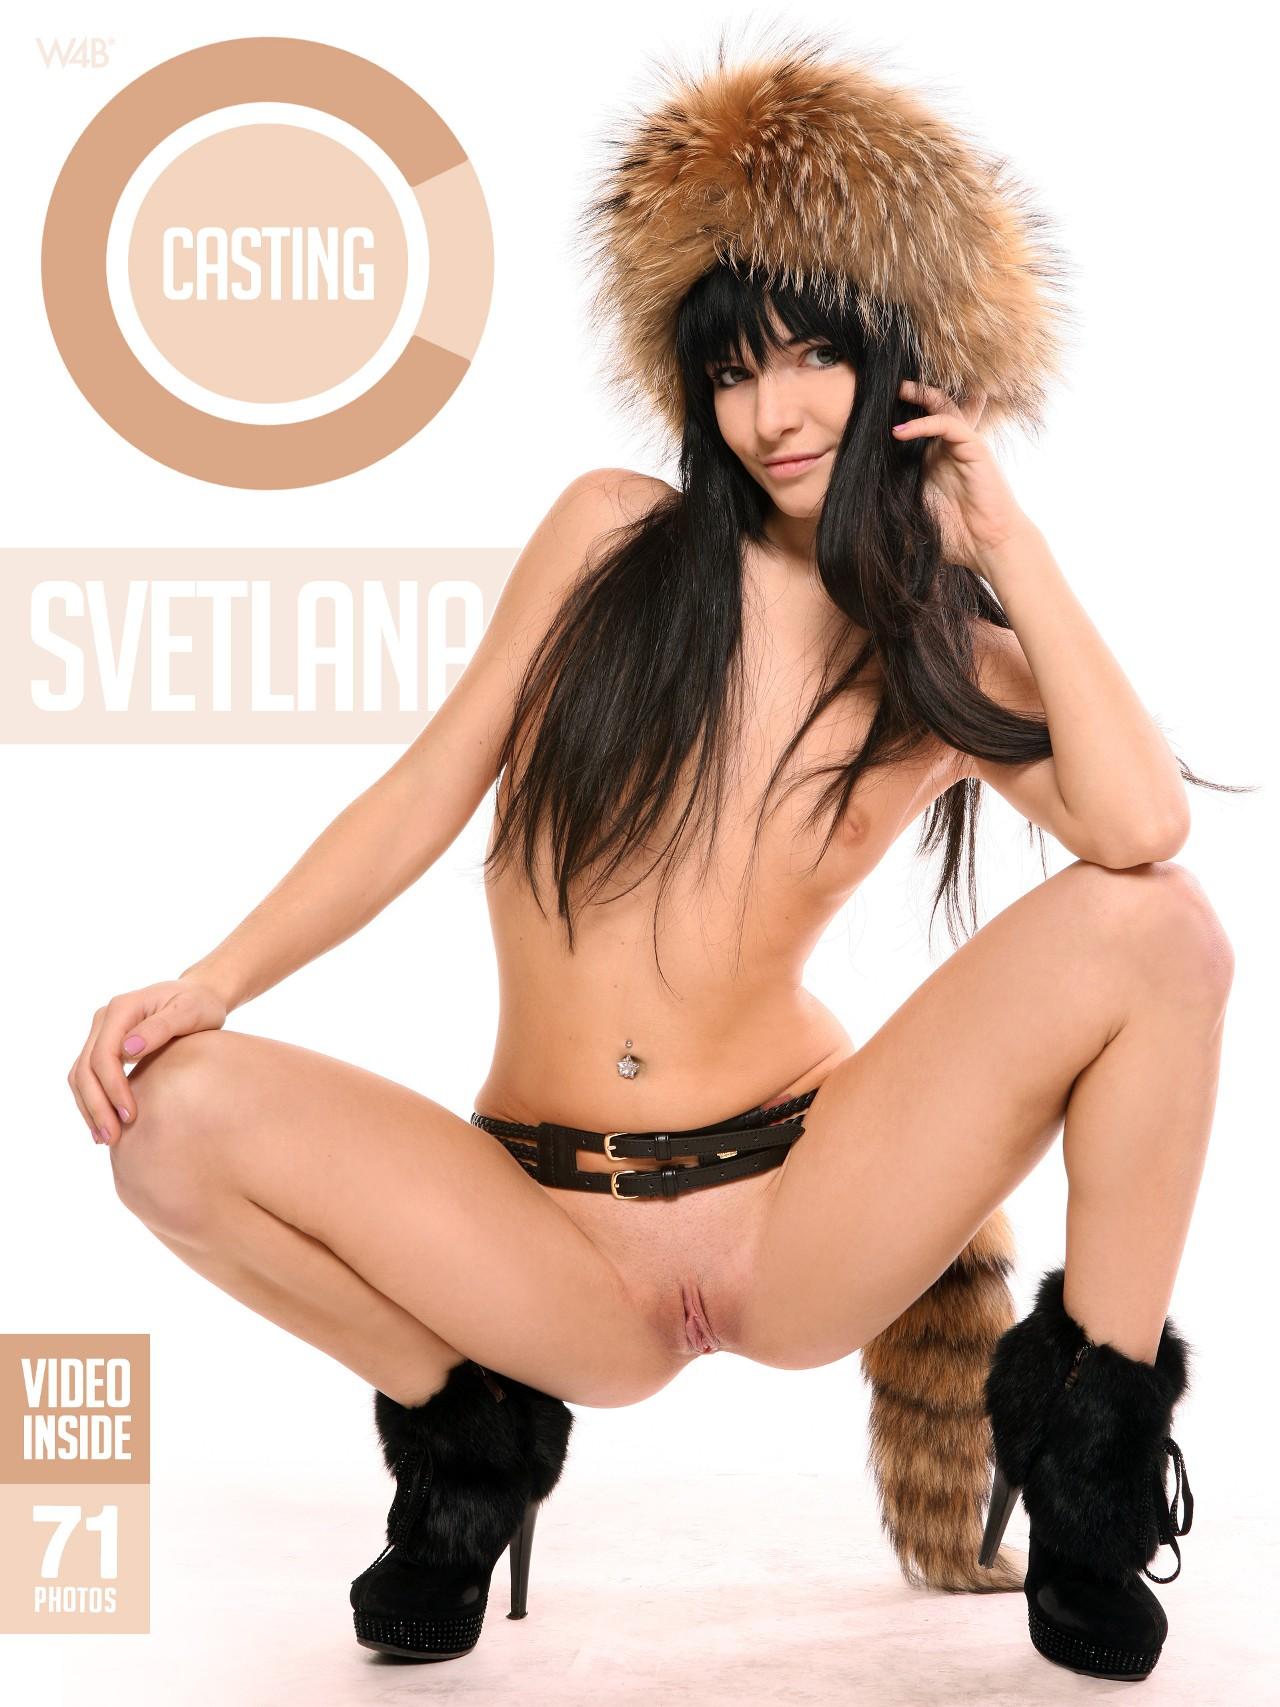 Svetlana: CASTING Svetlana